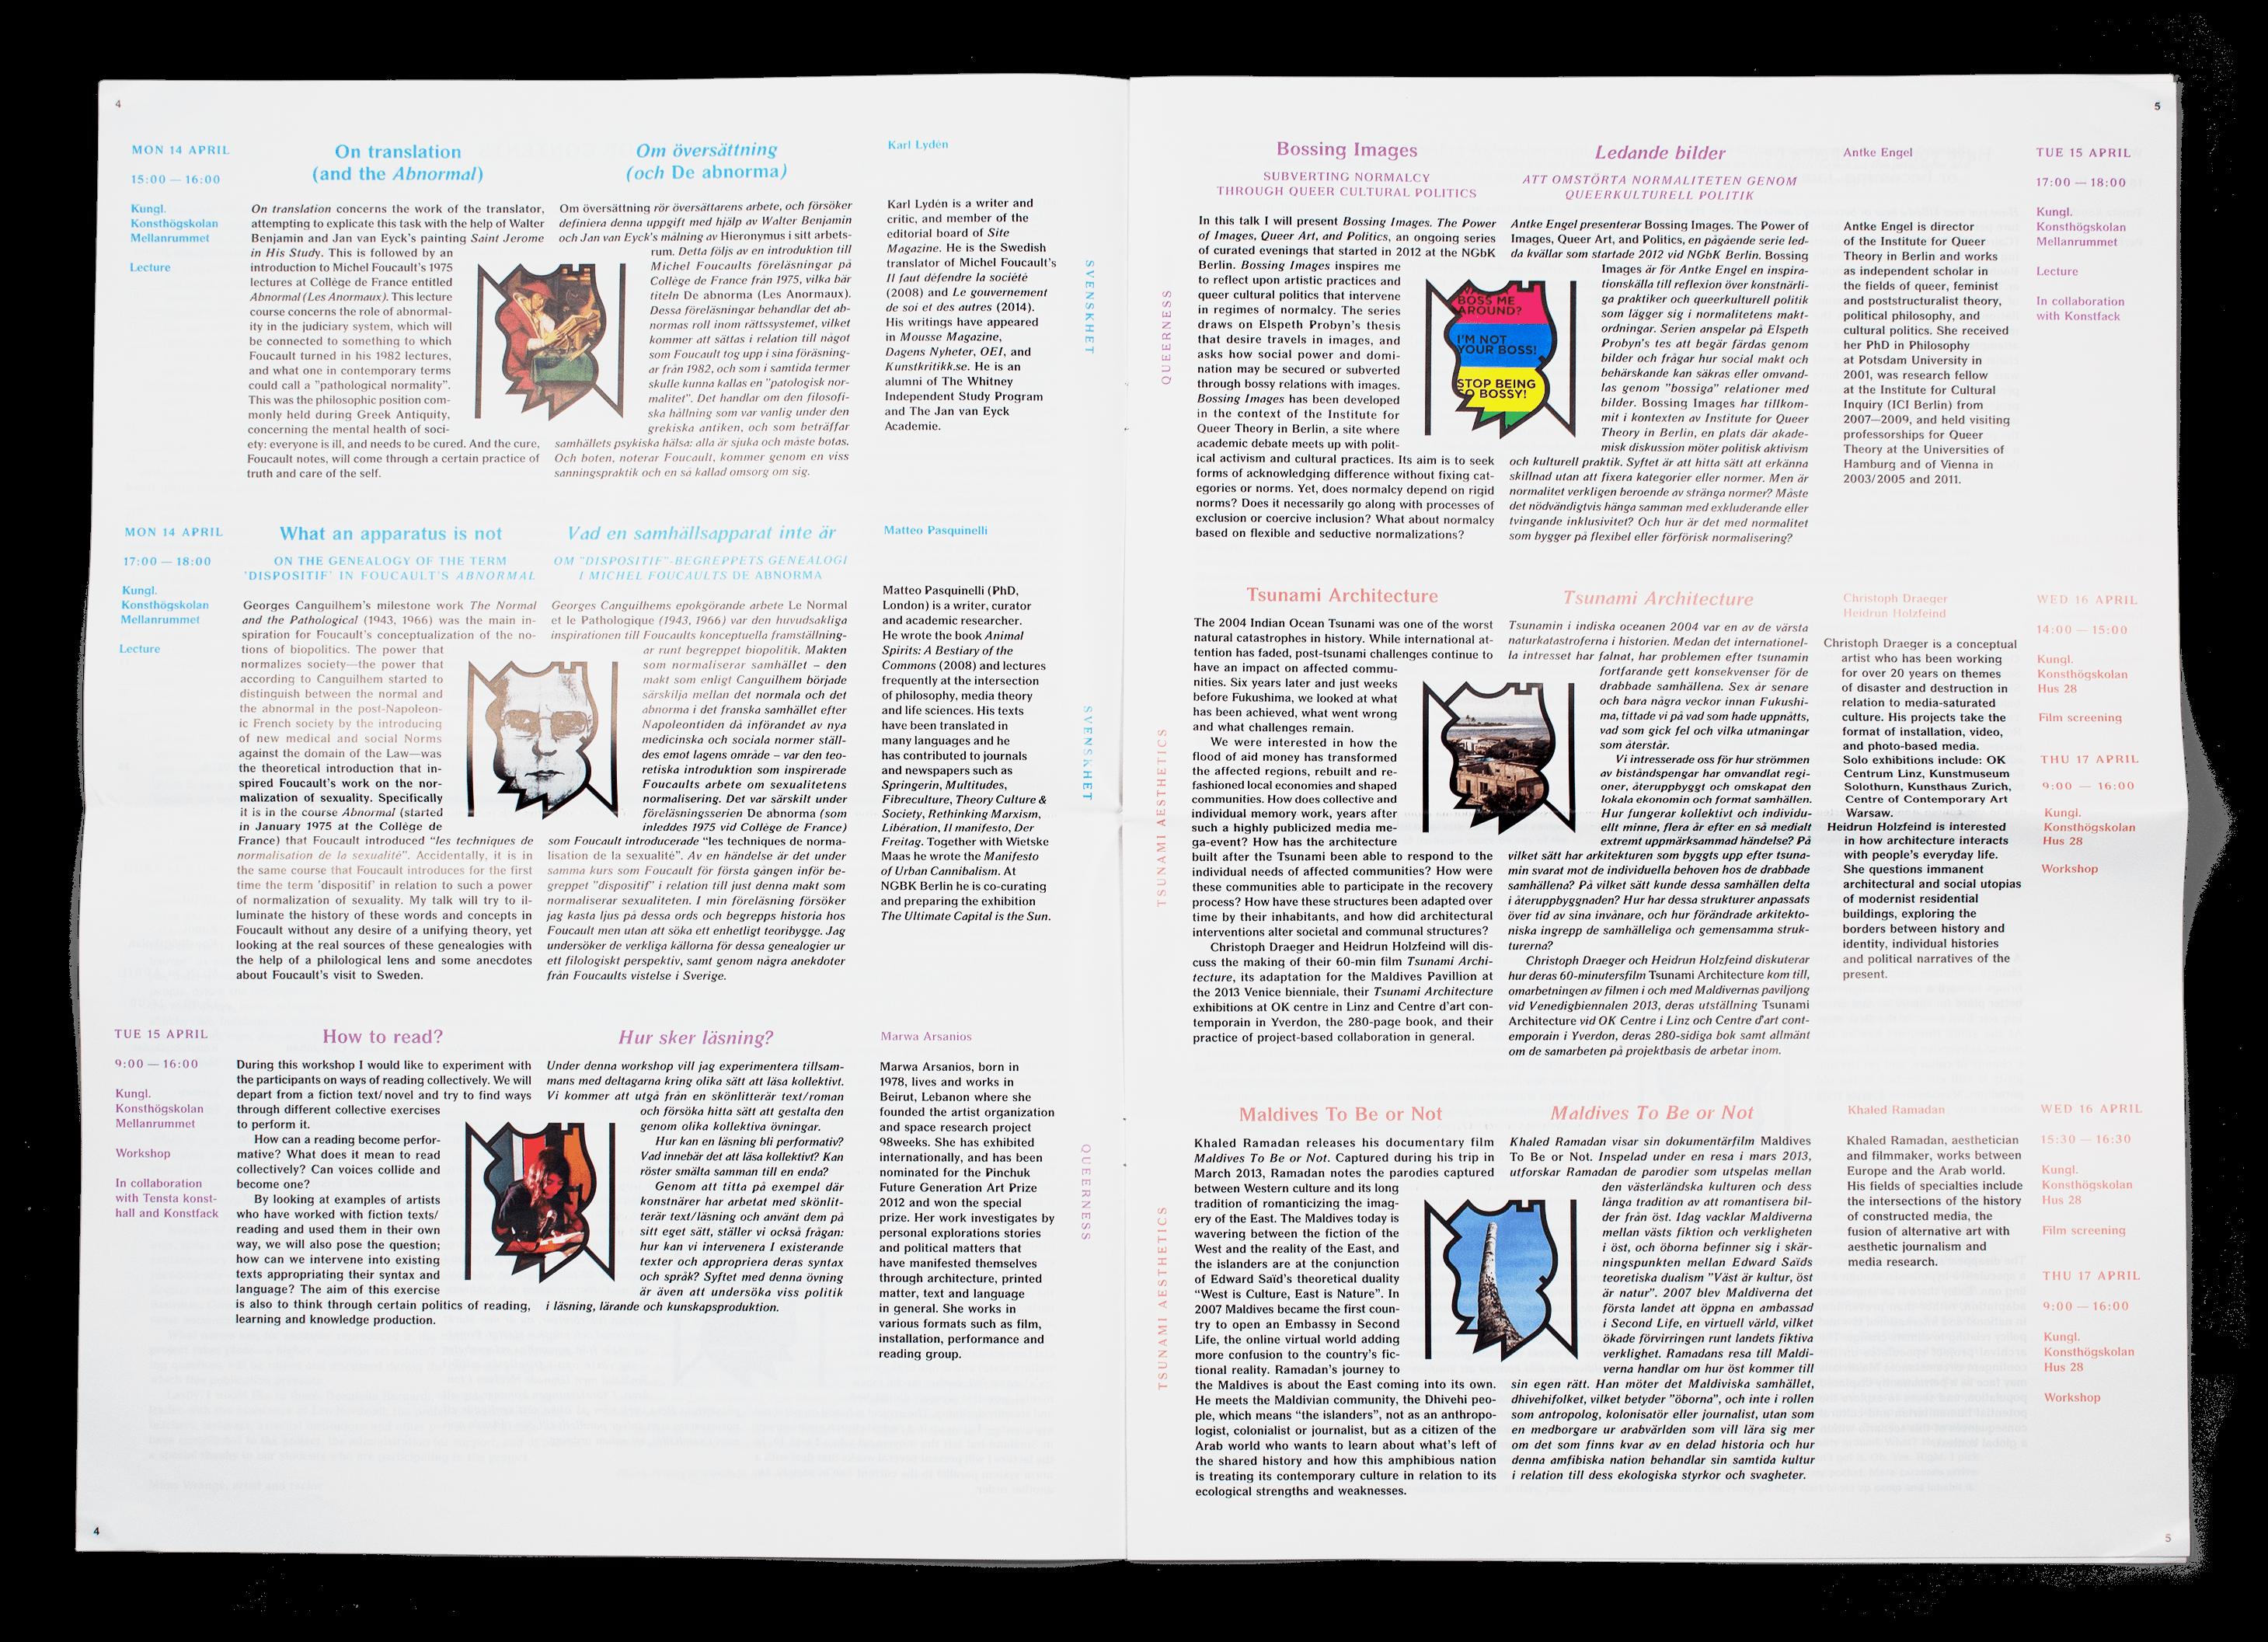 Programme de la Normalcy biennial, organisée par la Kungl. Konsthögskolan, Stockholm. Mise en page en collaboration avec Leo Nordwall